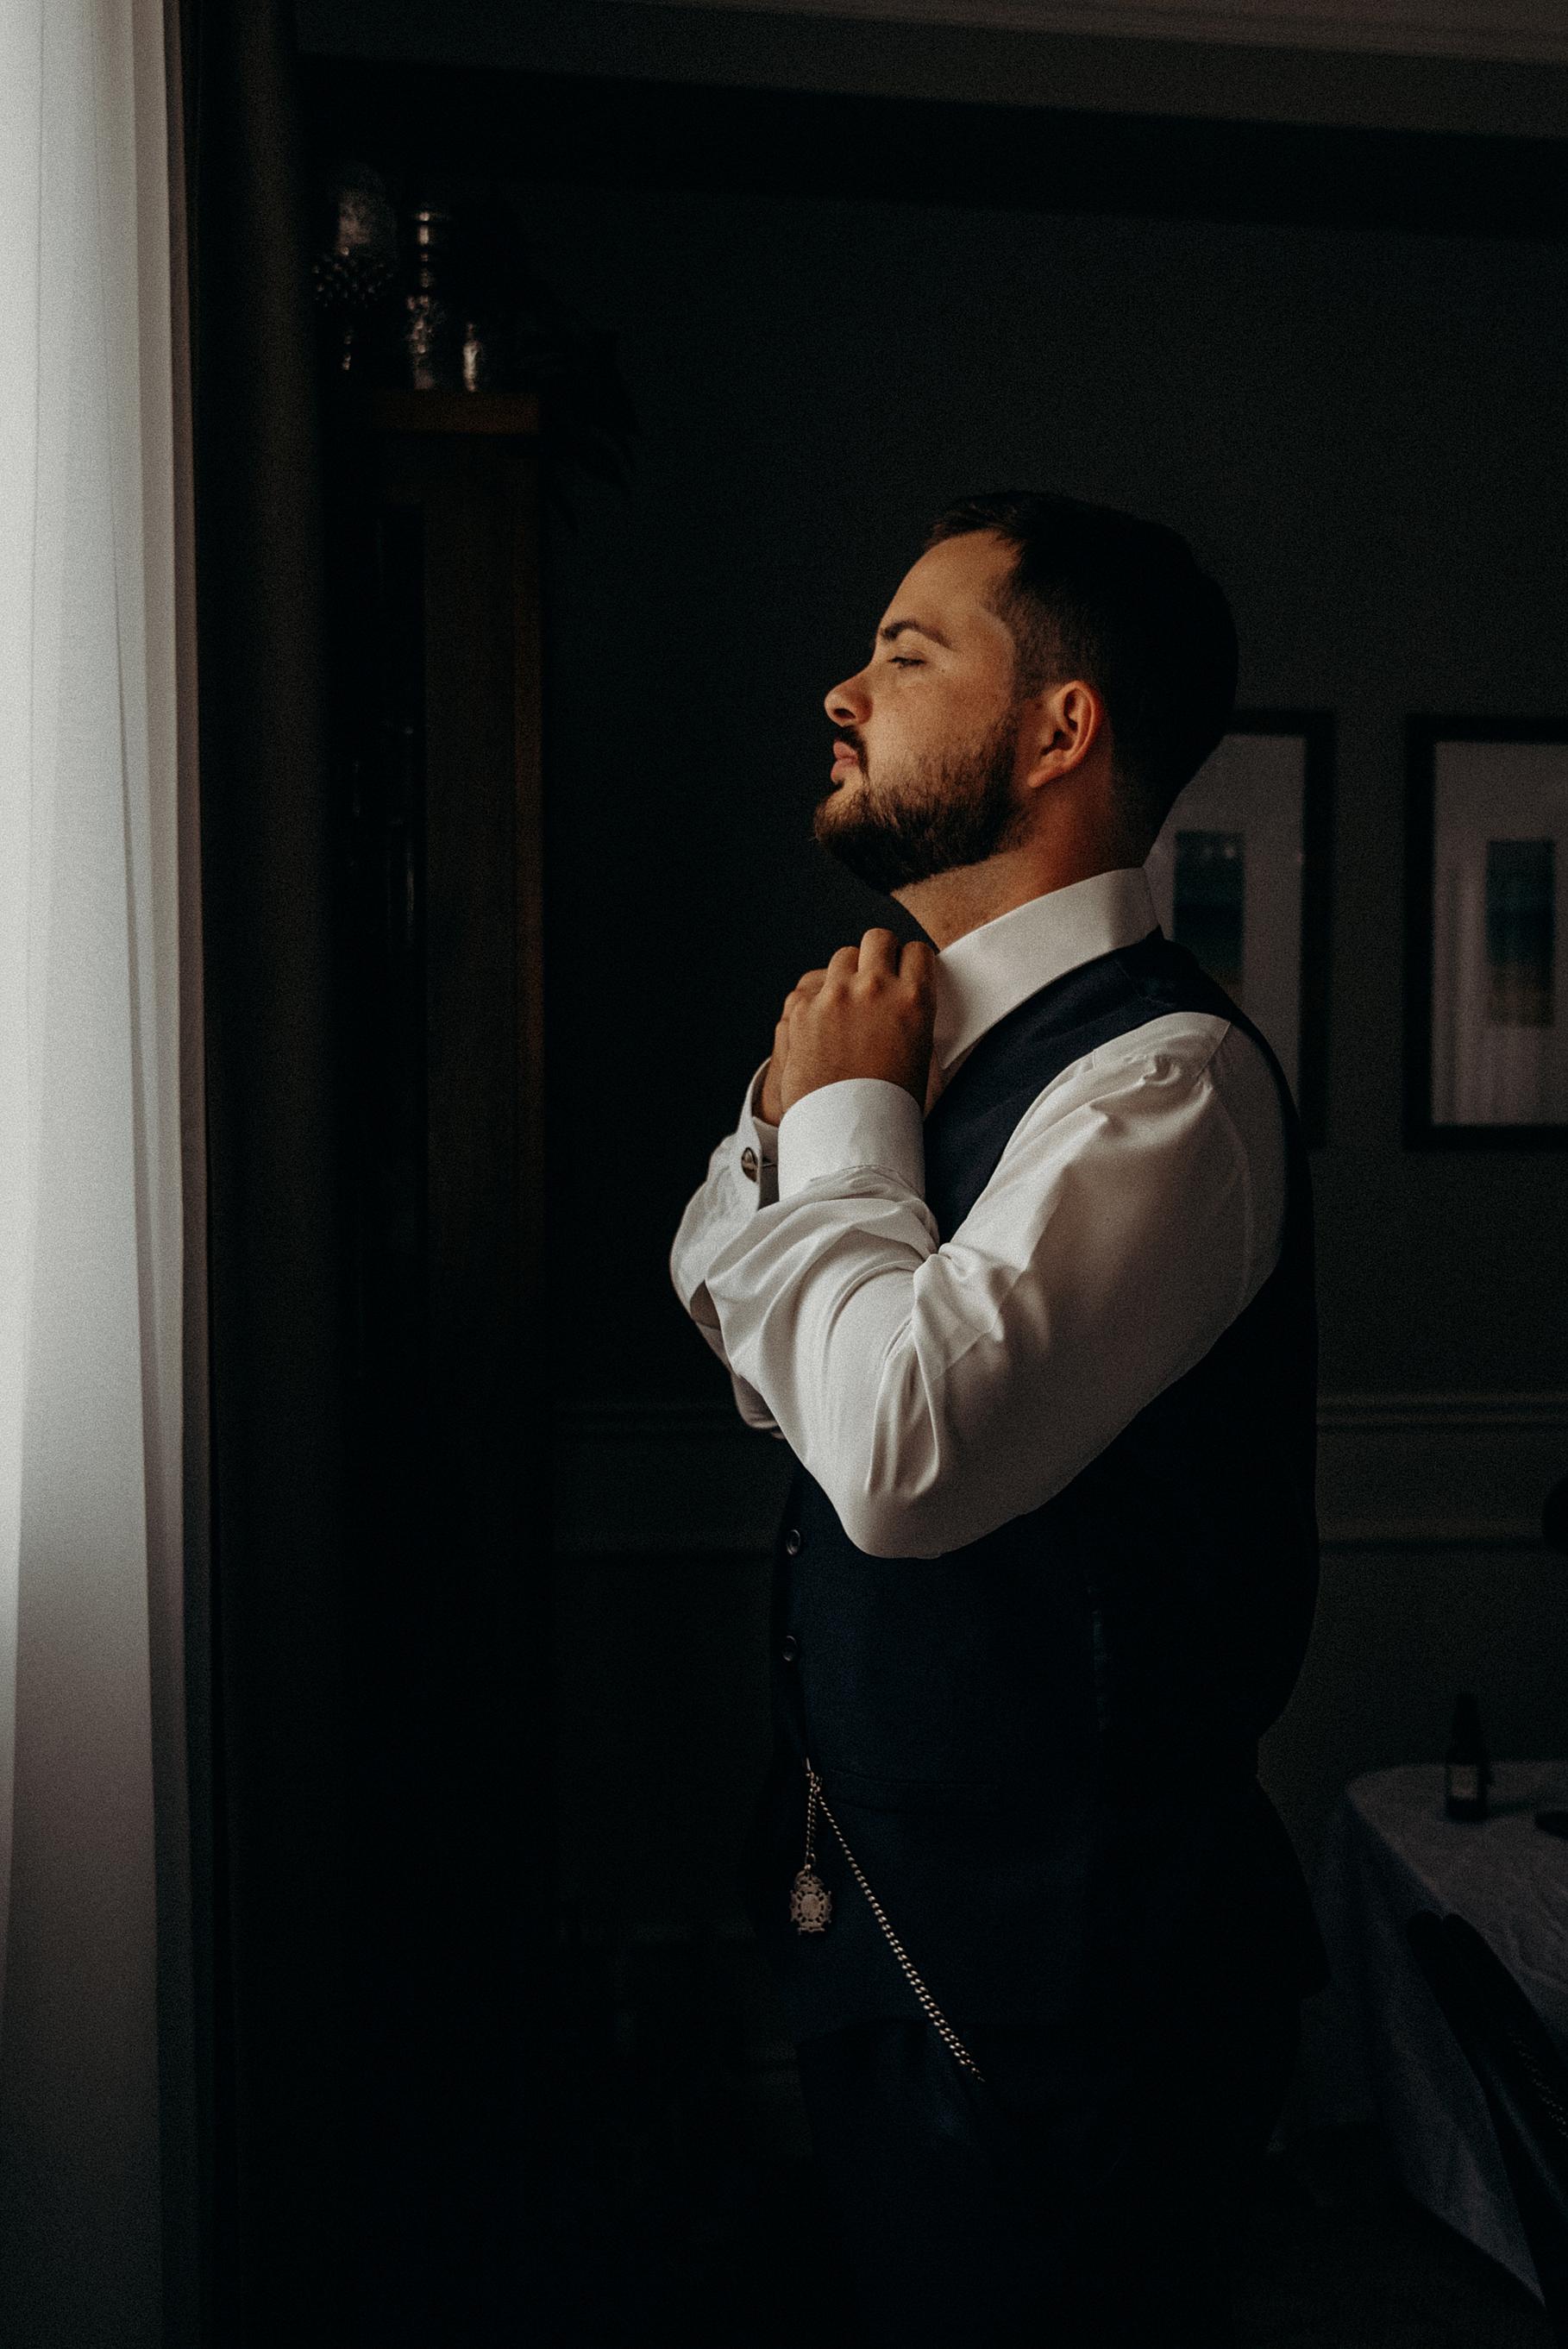 Saunders Farm Wedding Mocha Tree Studios Ottawa Toronto Montreal Wedding and Engagement Photographer and Videographer Dark Moody Intimate Authentic Modern Romantic Cinematic Best Candid 4